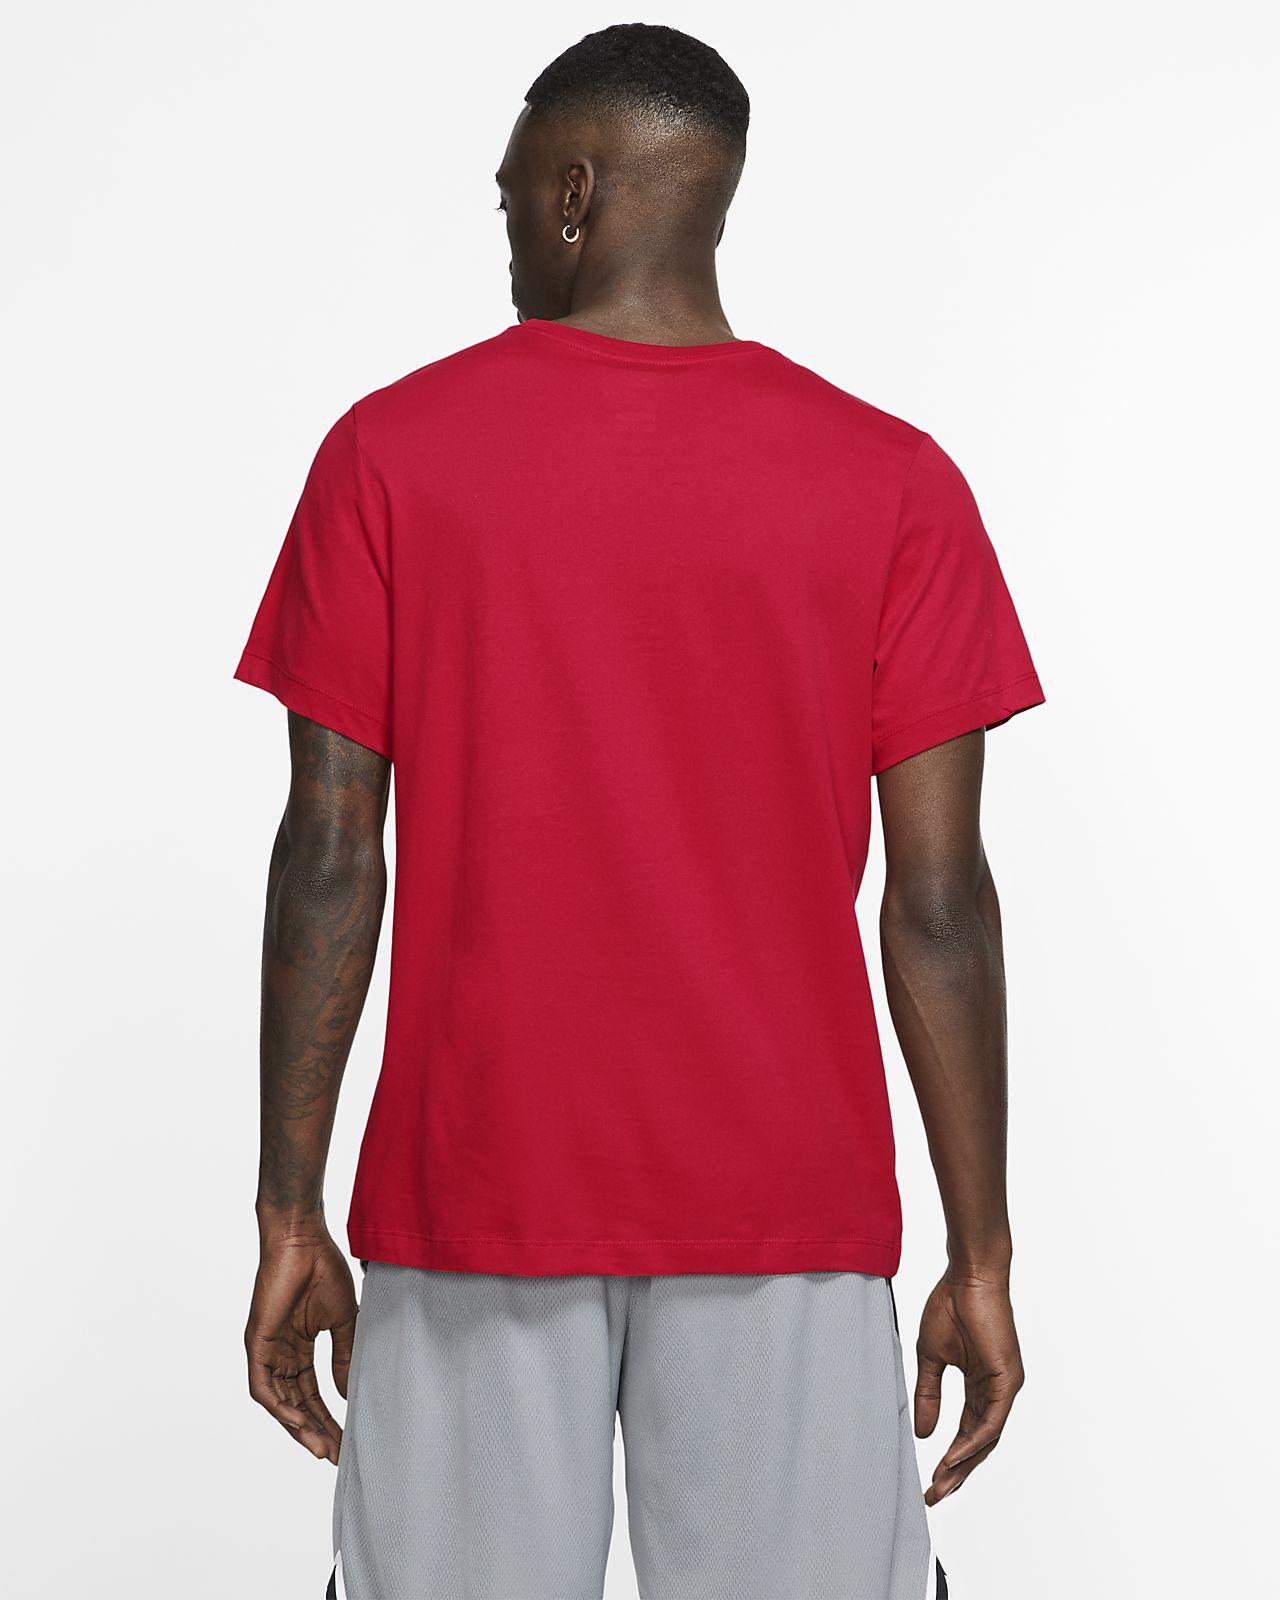 new concept 21c19 86288 ... Tee-shirt de basketball Nike Dri-FIT « Just Do It. » pour